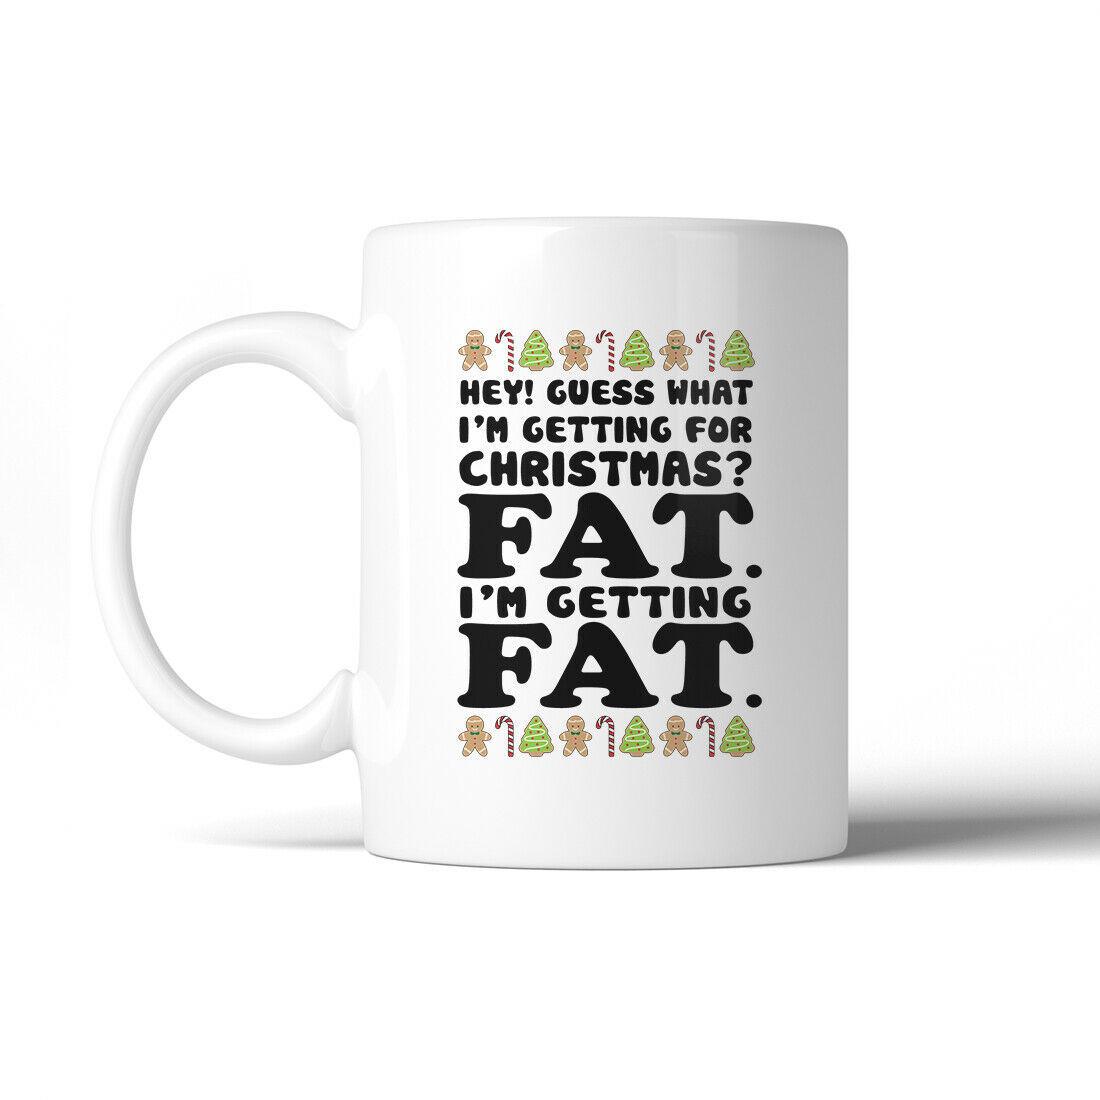 365 Printing Getting Fat Christmas Funny WHITE Mug X-mas Gift Idea